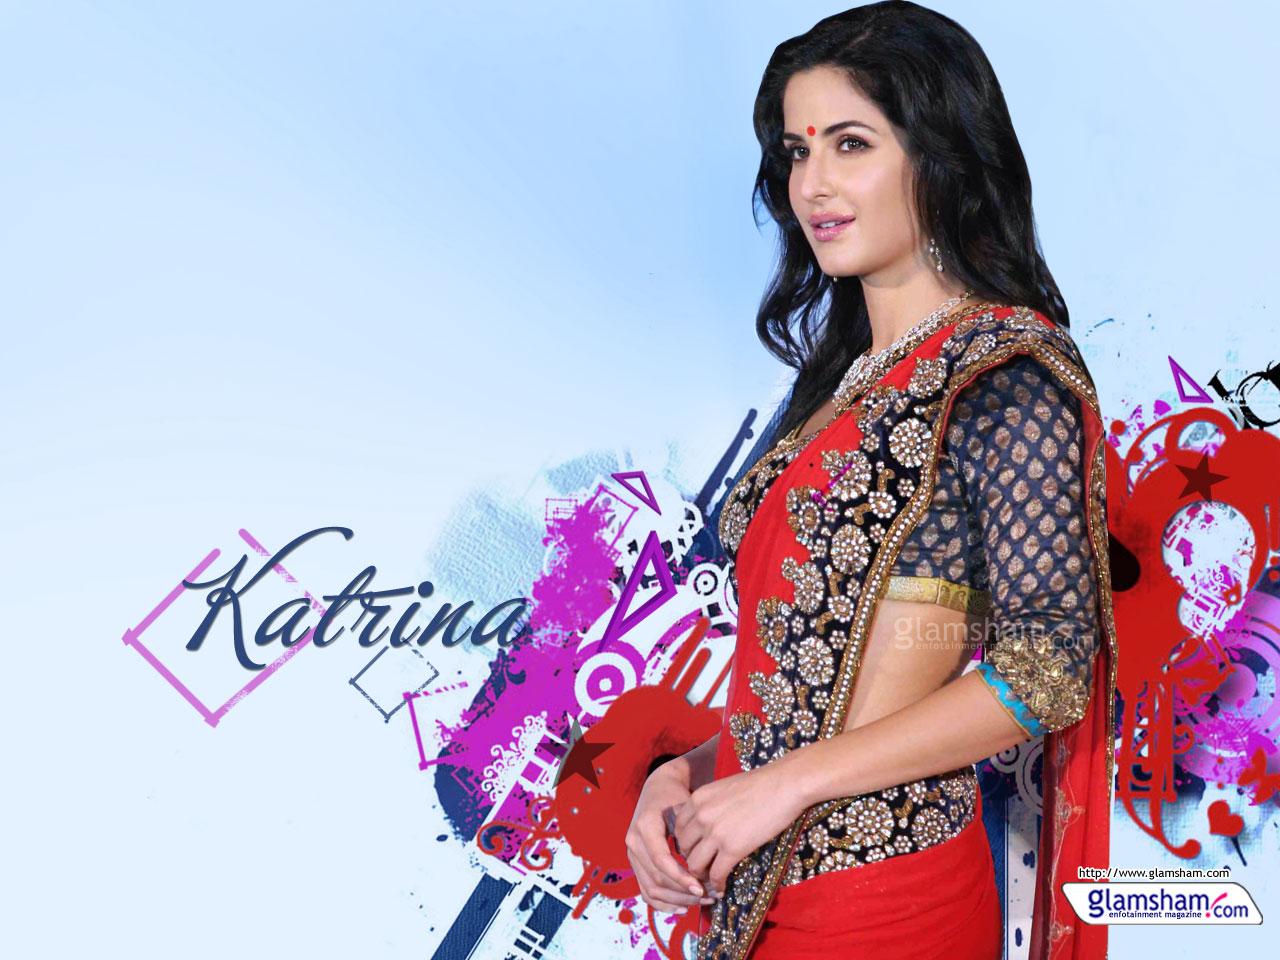 Katrina Kaif - Agent, Manager, Publicist Contact Info